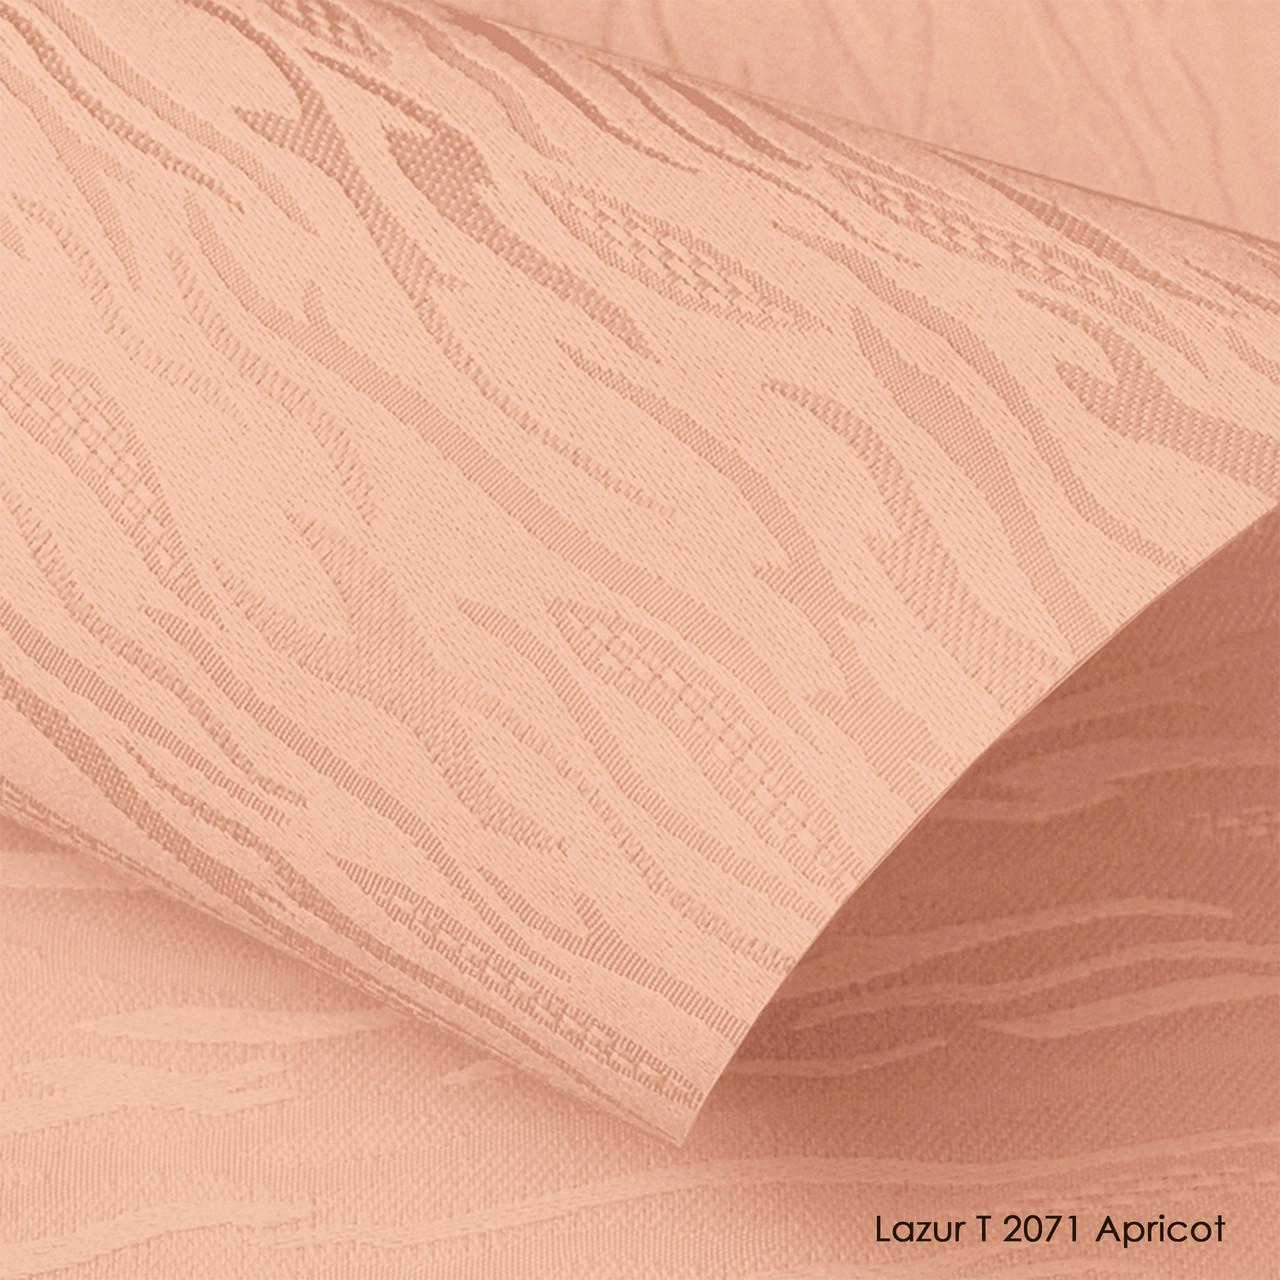 Lazur T 2071 Apricot